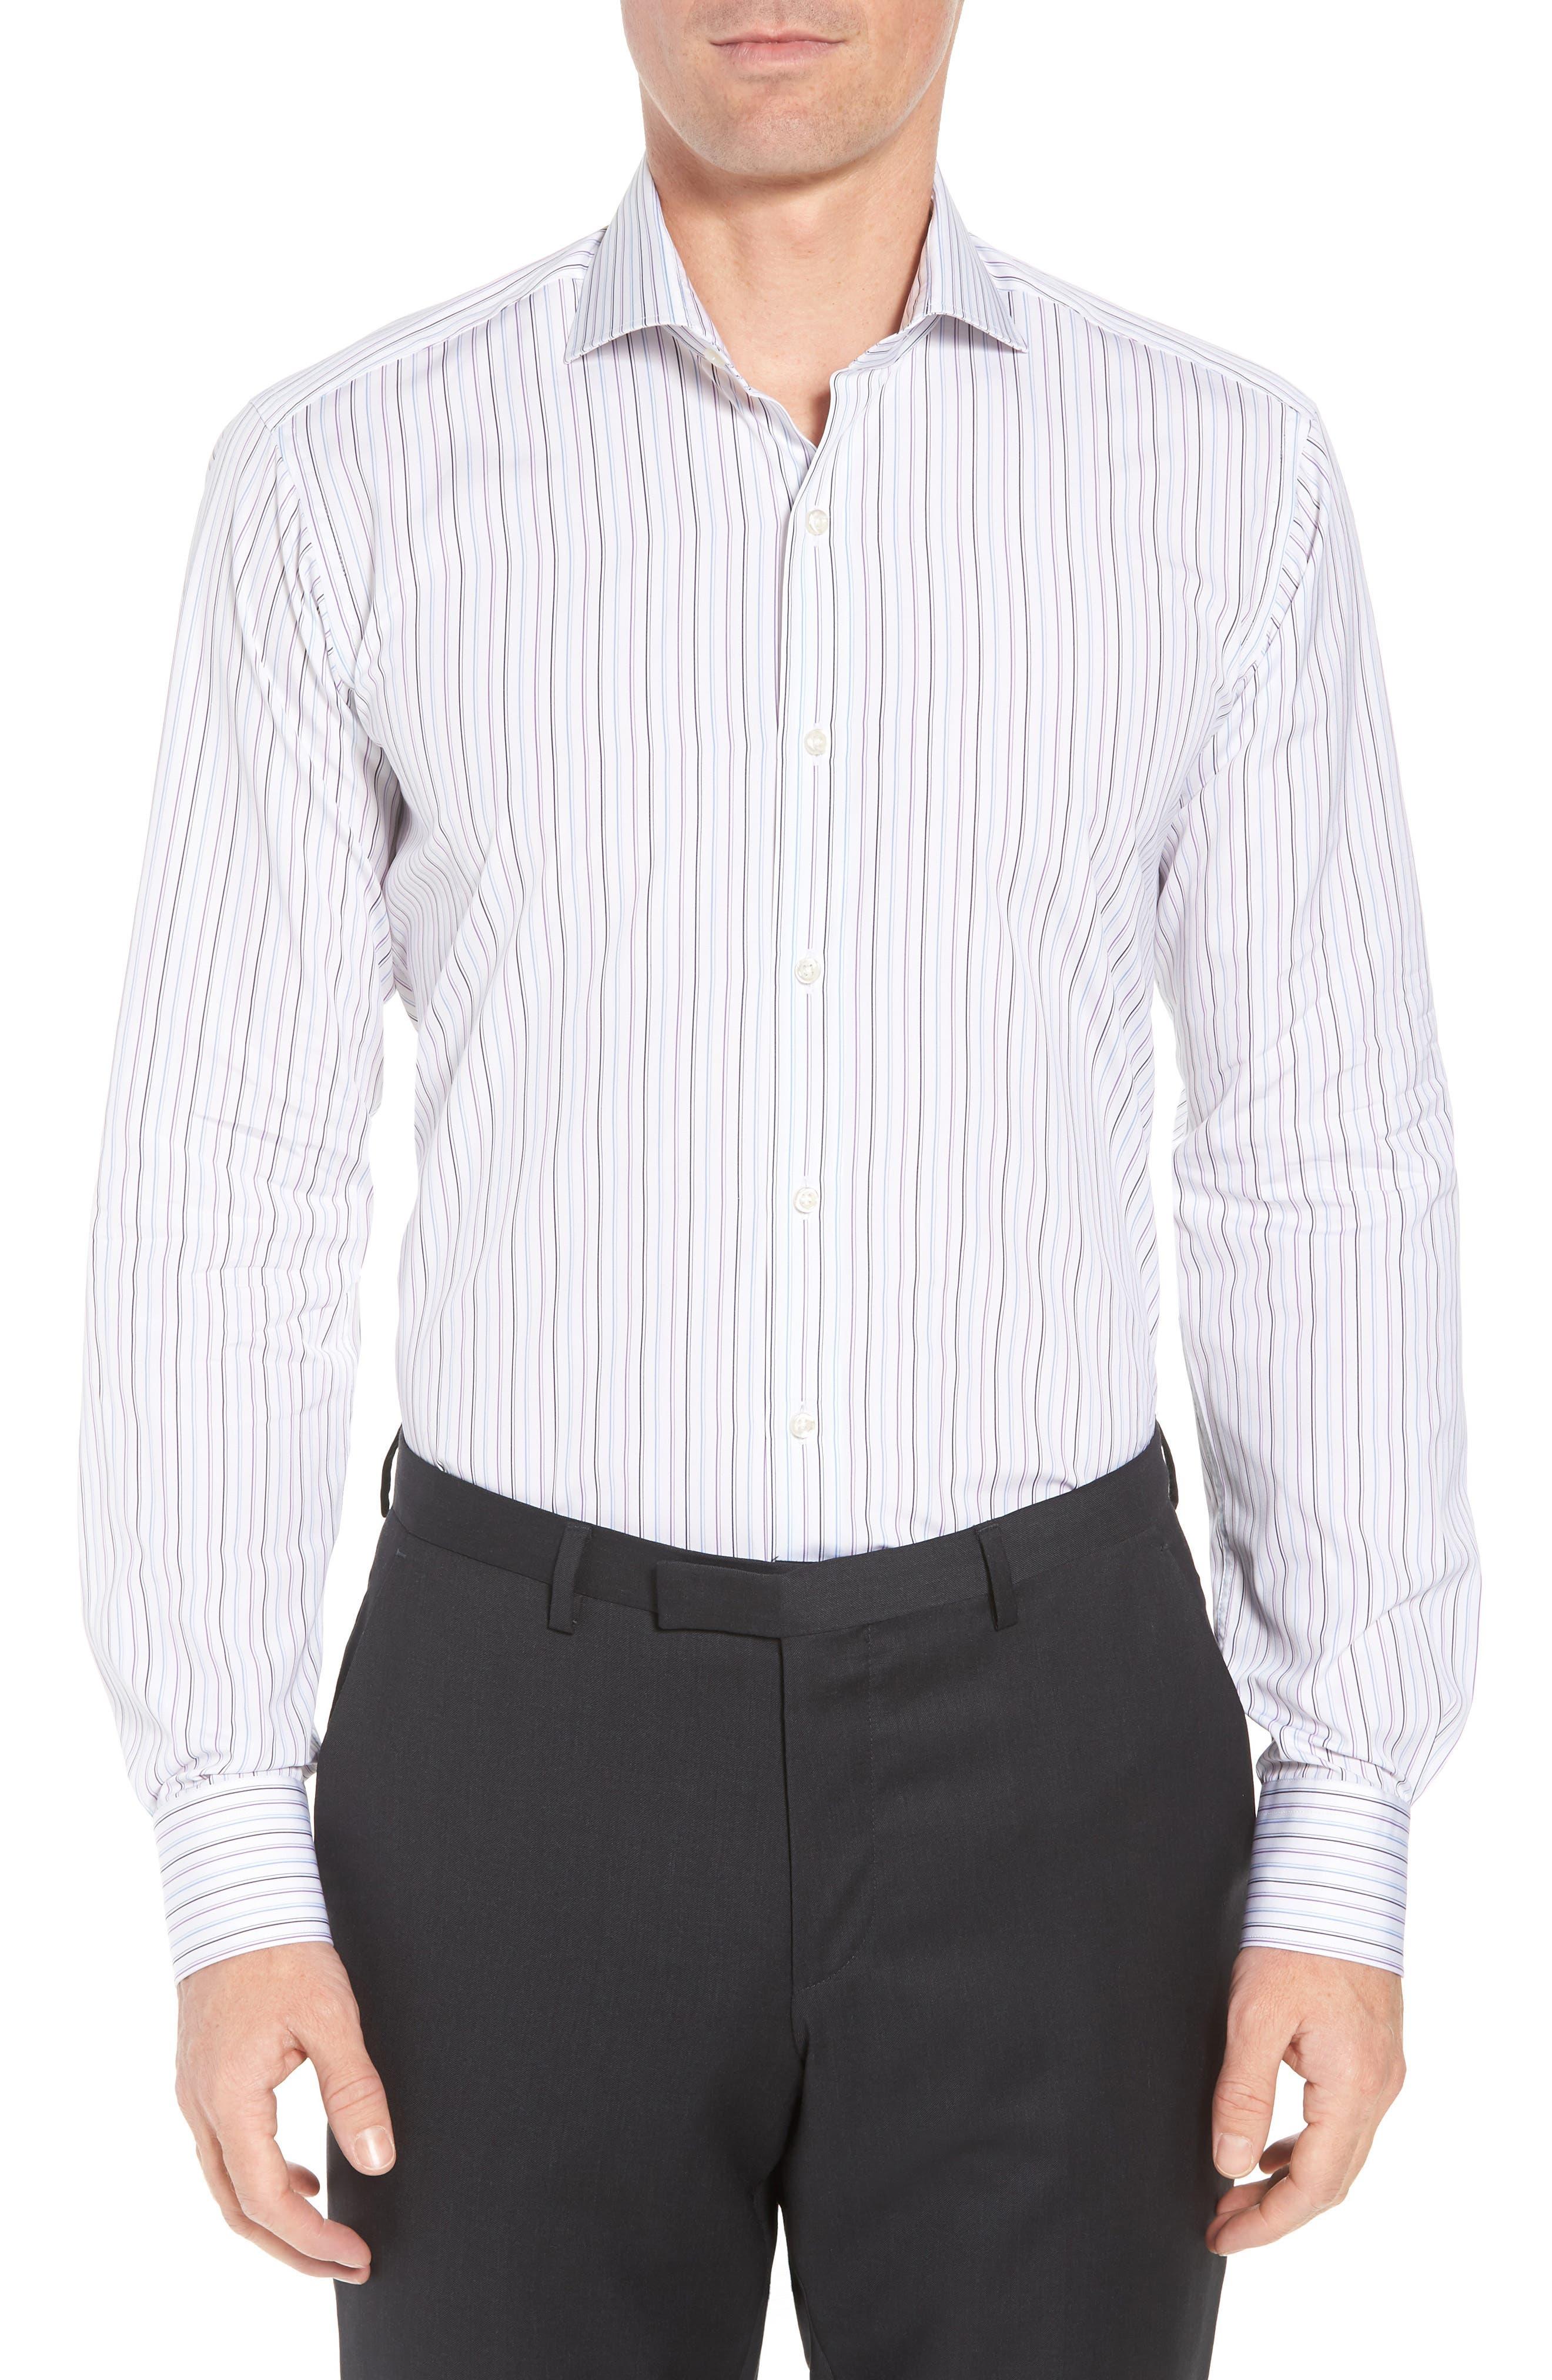 Regular Fit Stripe Dress Shirt,                         Main,                         color, WHITE/ BLUE/ PURPLE